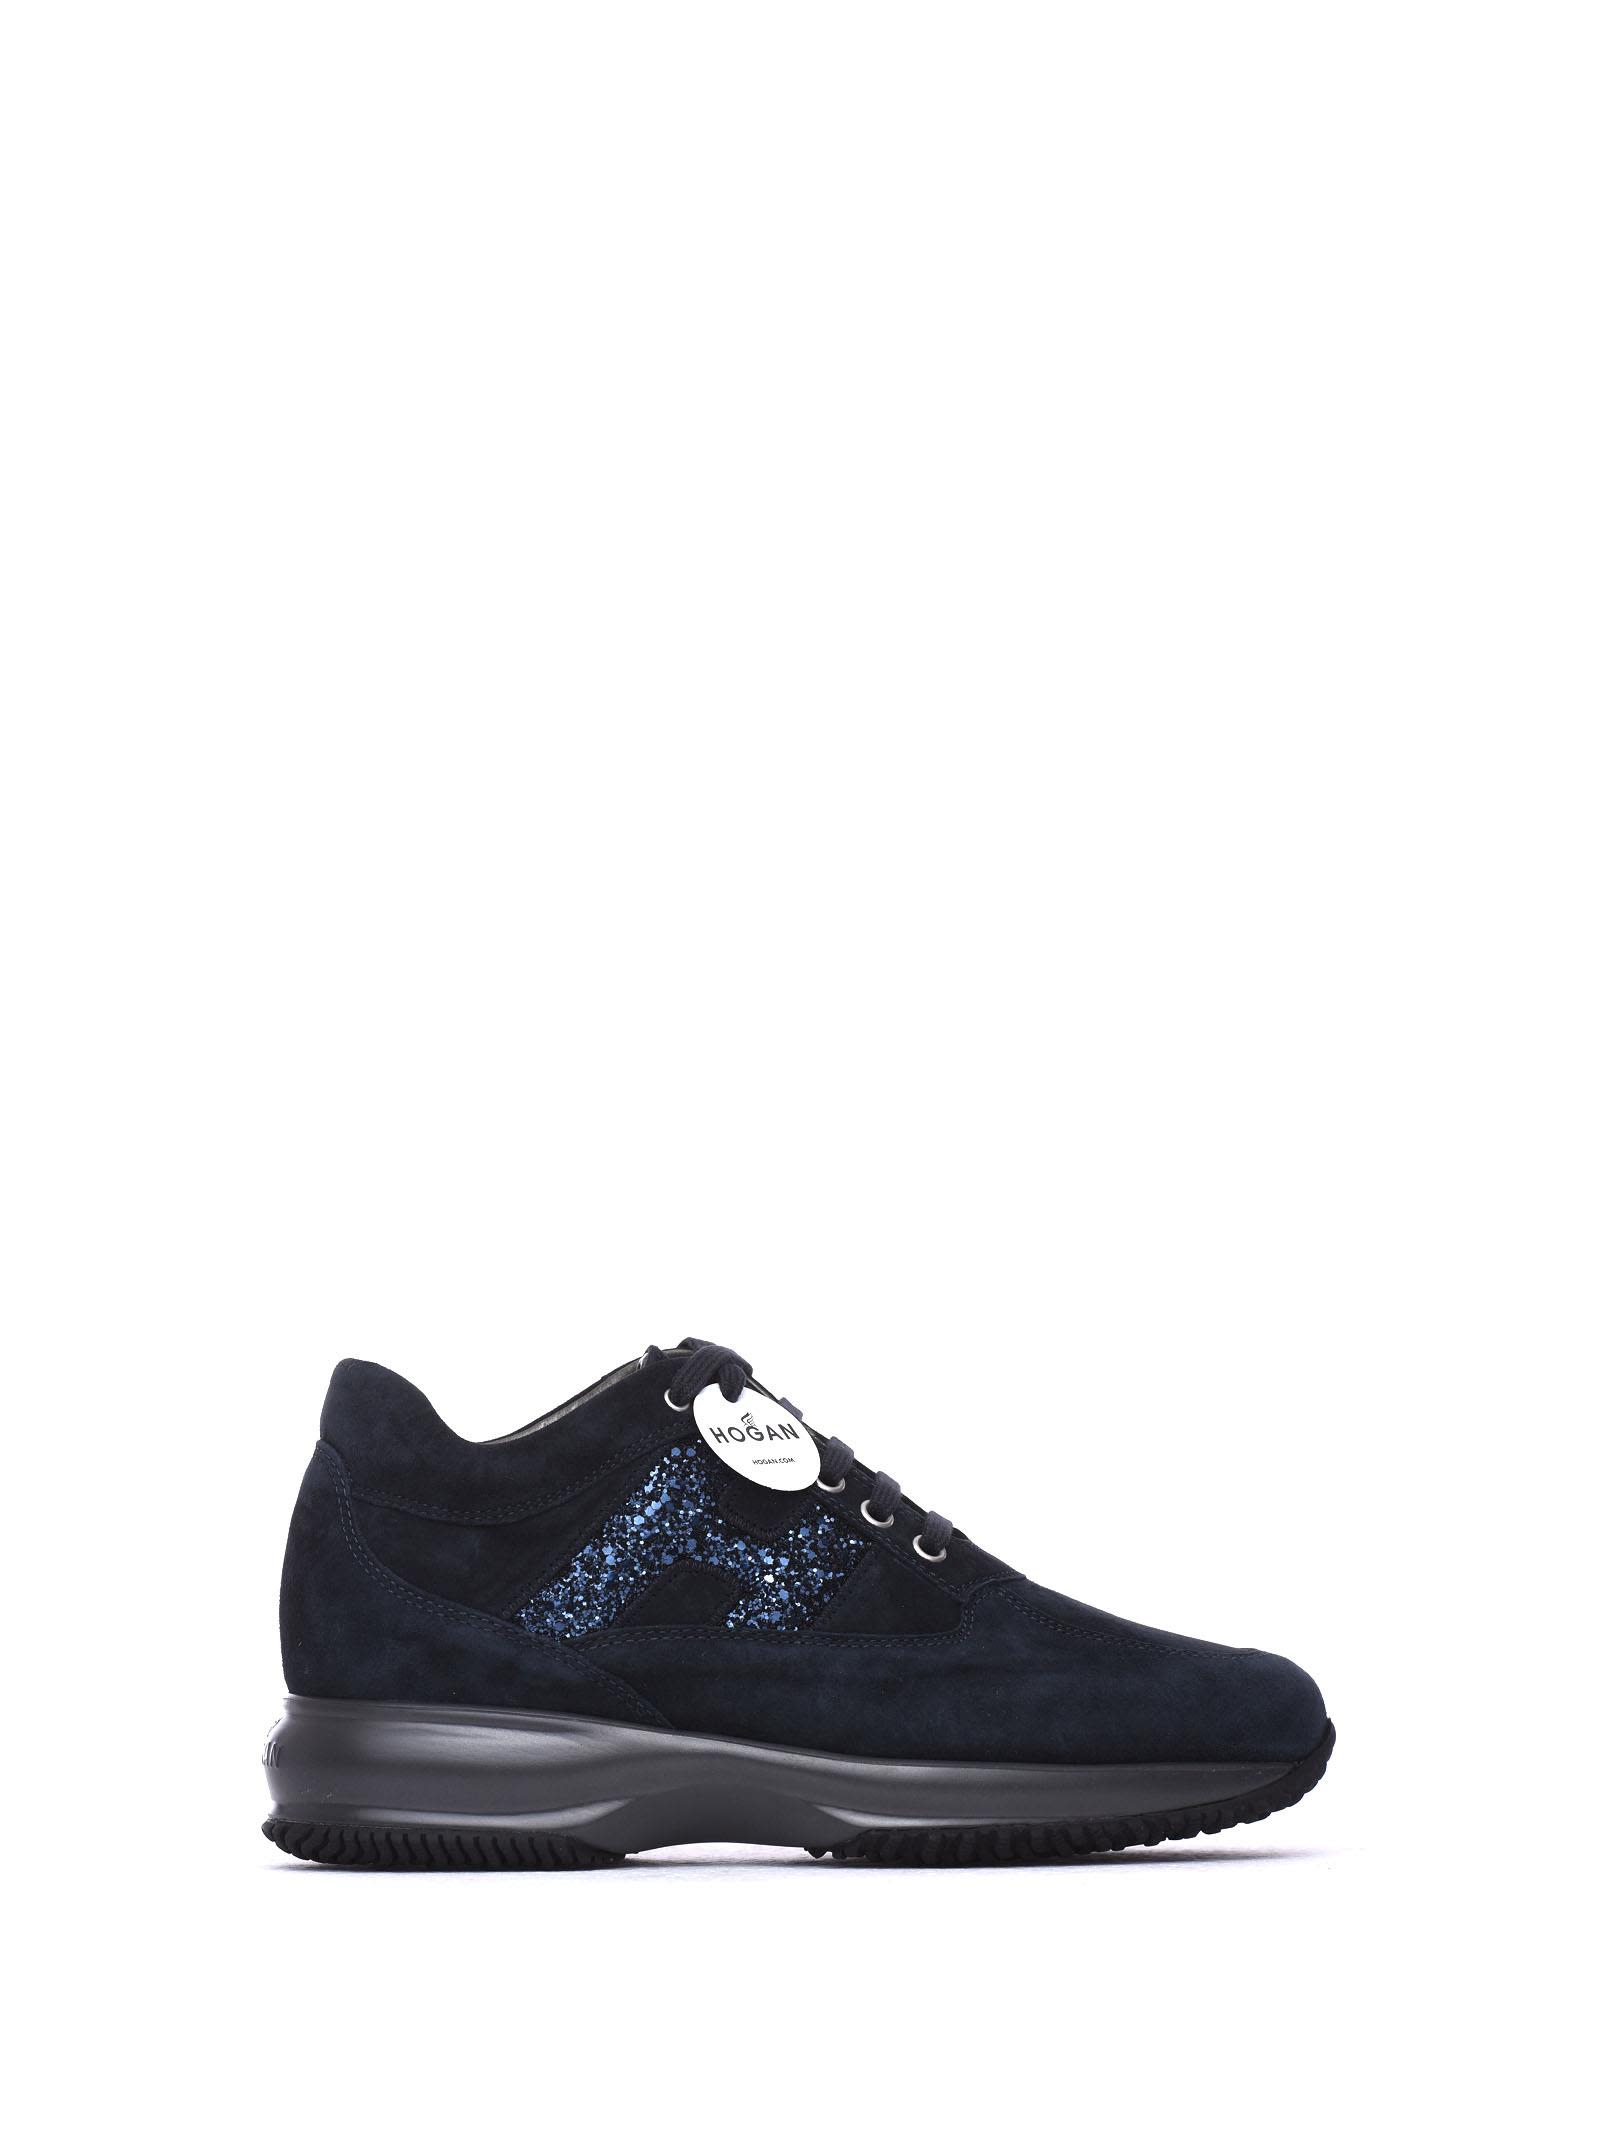 Hogan Sneakers Interactive Dark Blue And Glitter